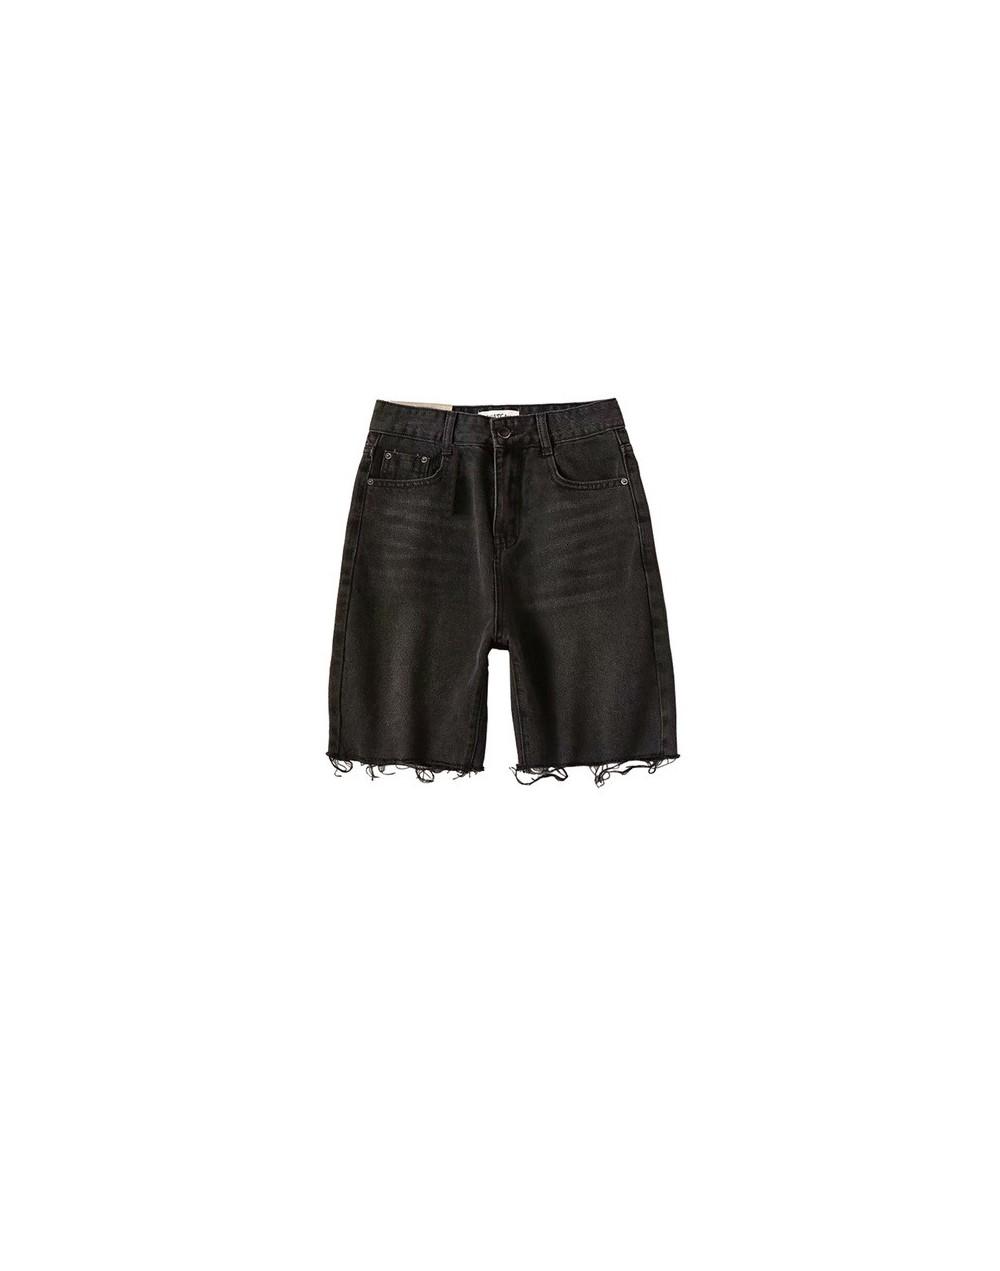 Summer Denim Biker Shorts Women High Waisted Jean Shorts Mid Thigh Bermuda Shorts Female - Black - 4J4142137629-1